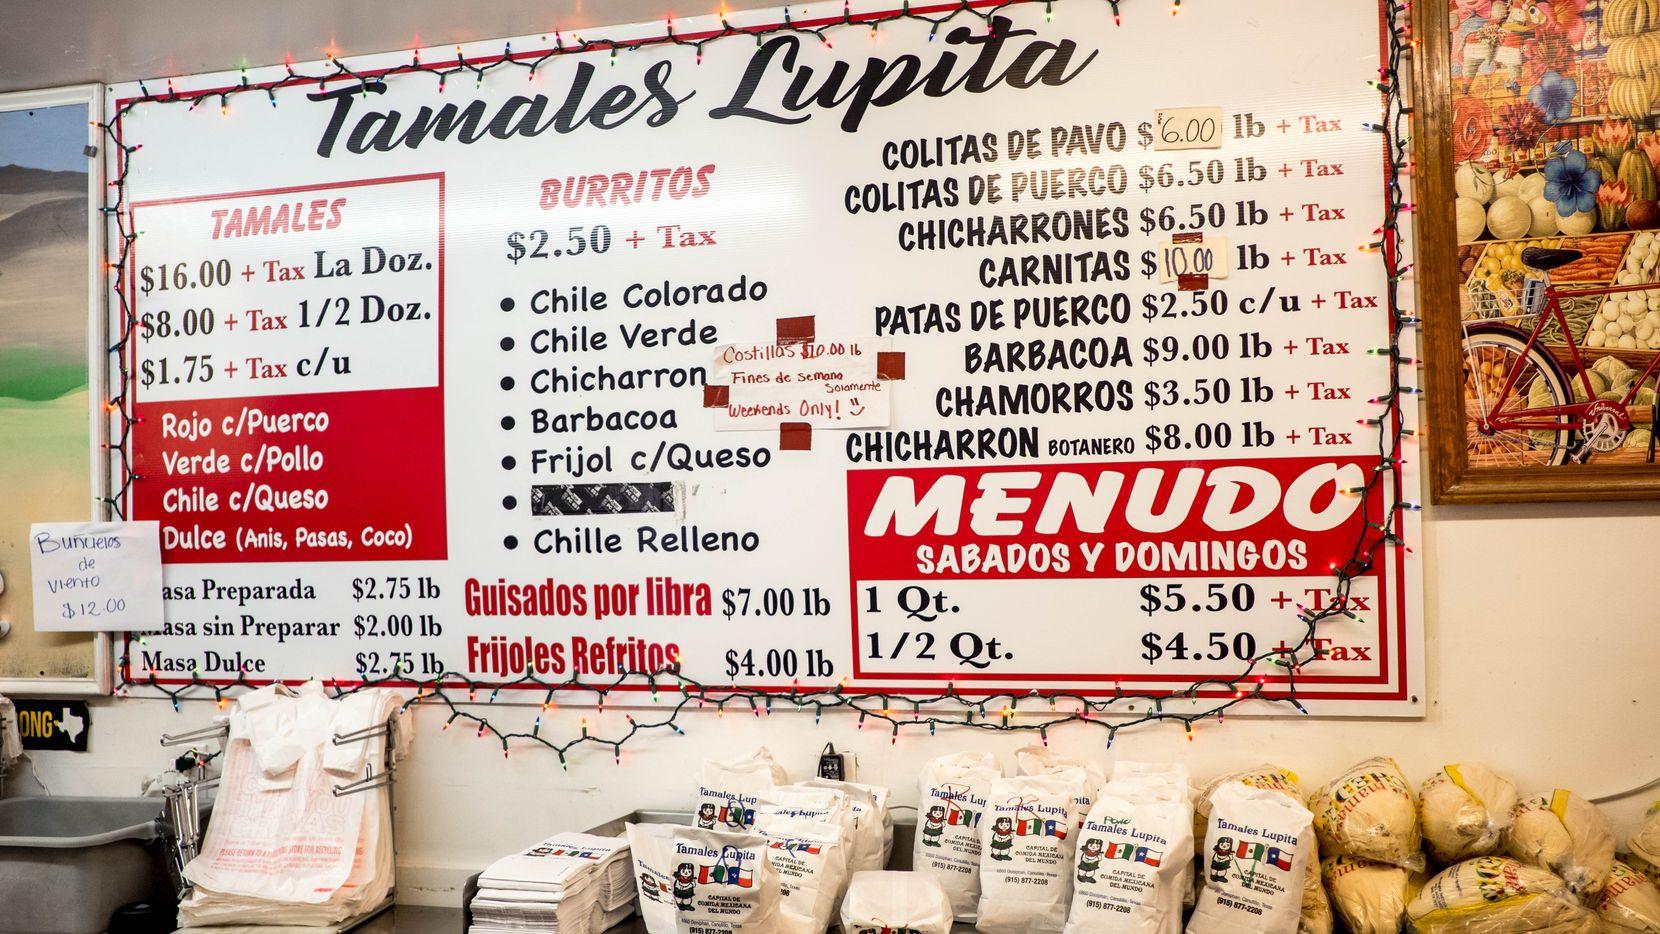 The menu at Tamales Lupita in Canutillo, Texas, on Friday, December, 18, 2020.